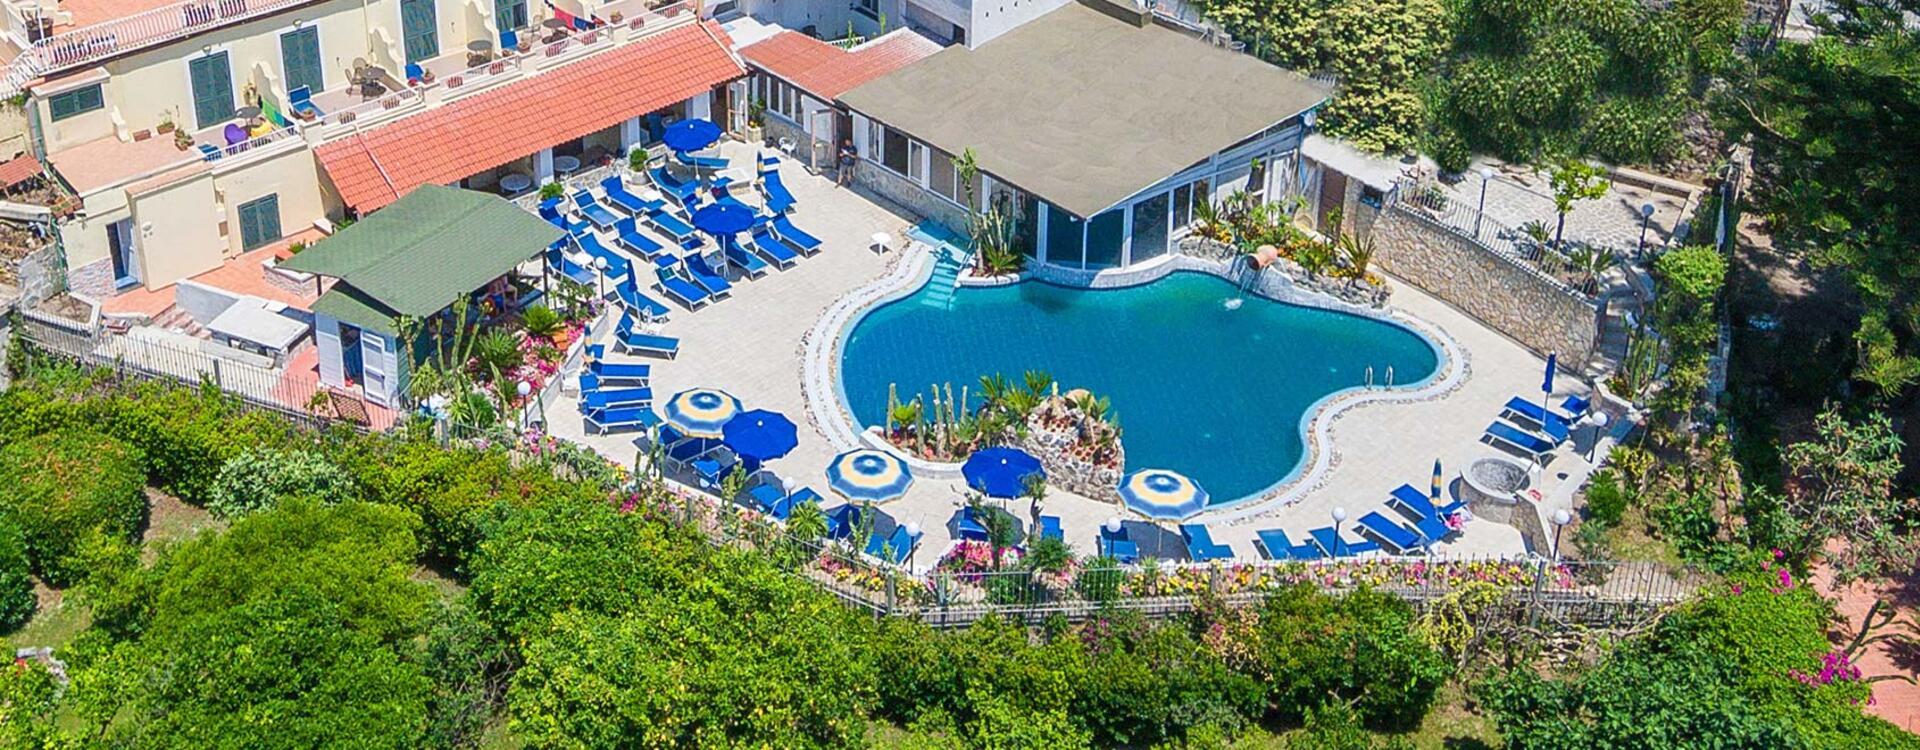 hotelsaintraphaelischia it last-minute-luglio-a-ischia 010